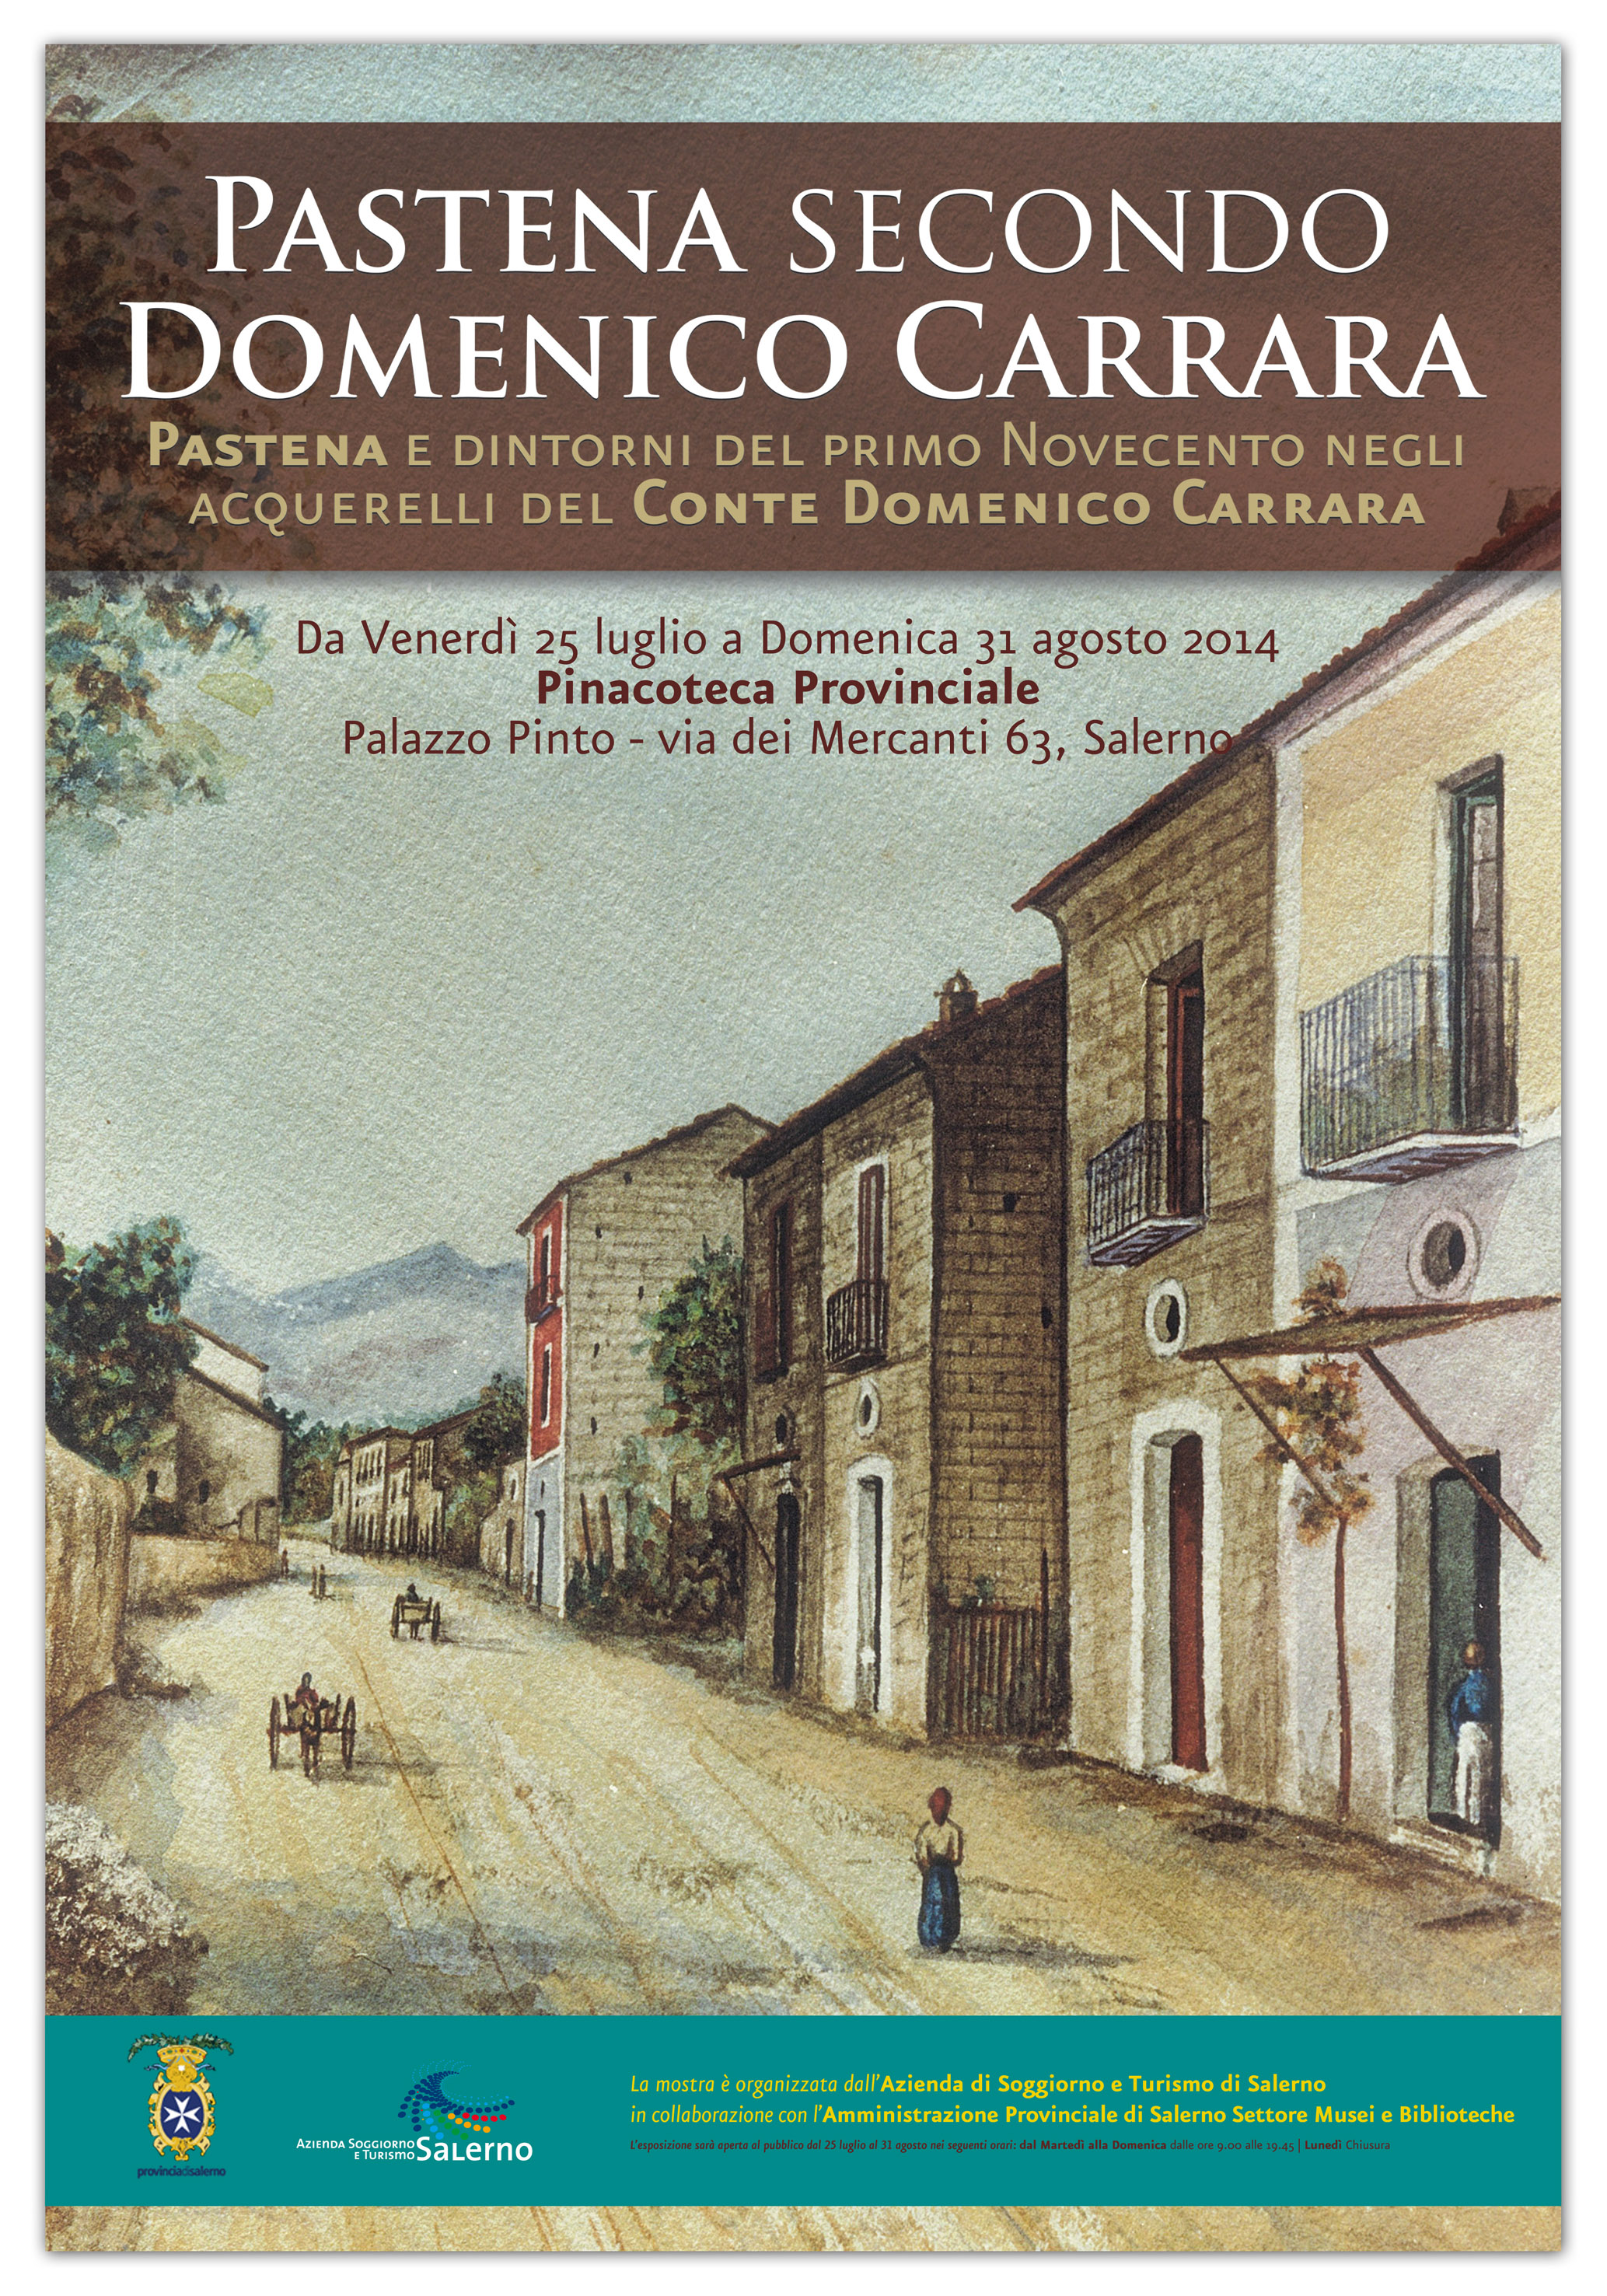 locandina acquerelli CARRARA